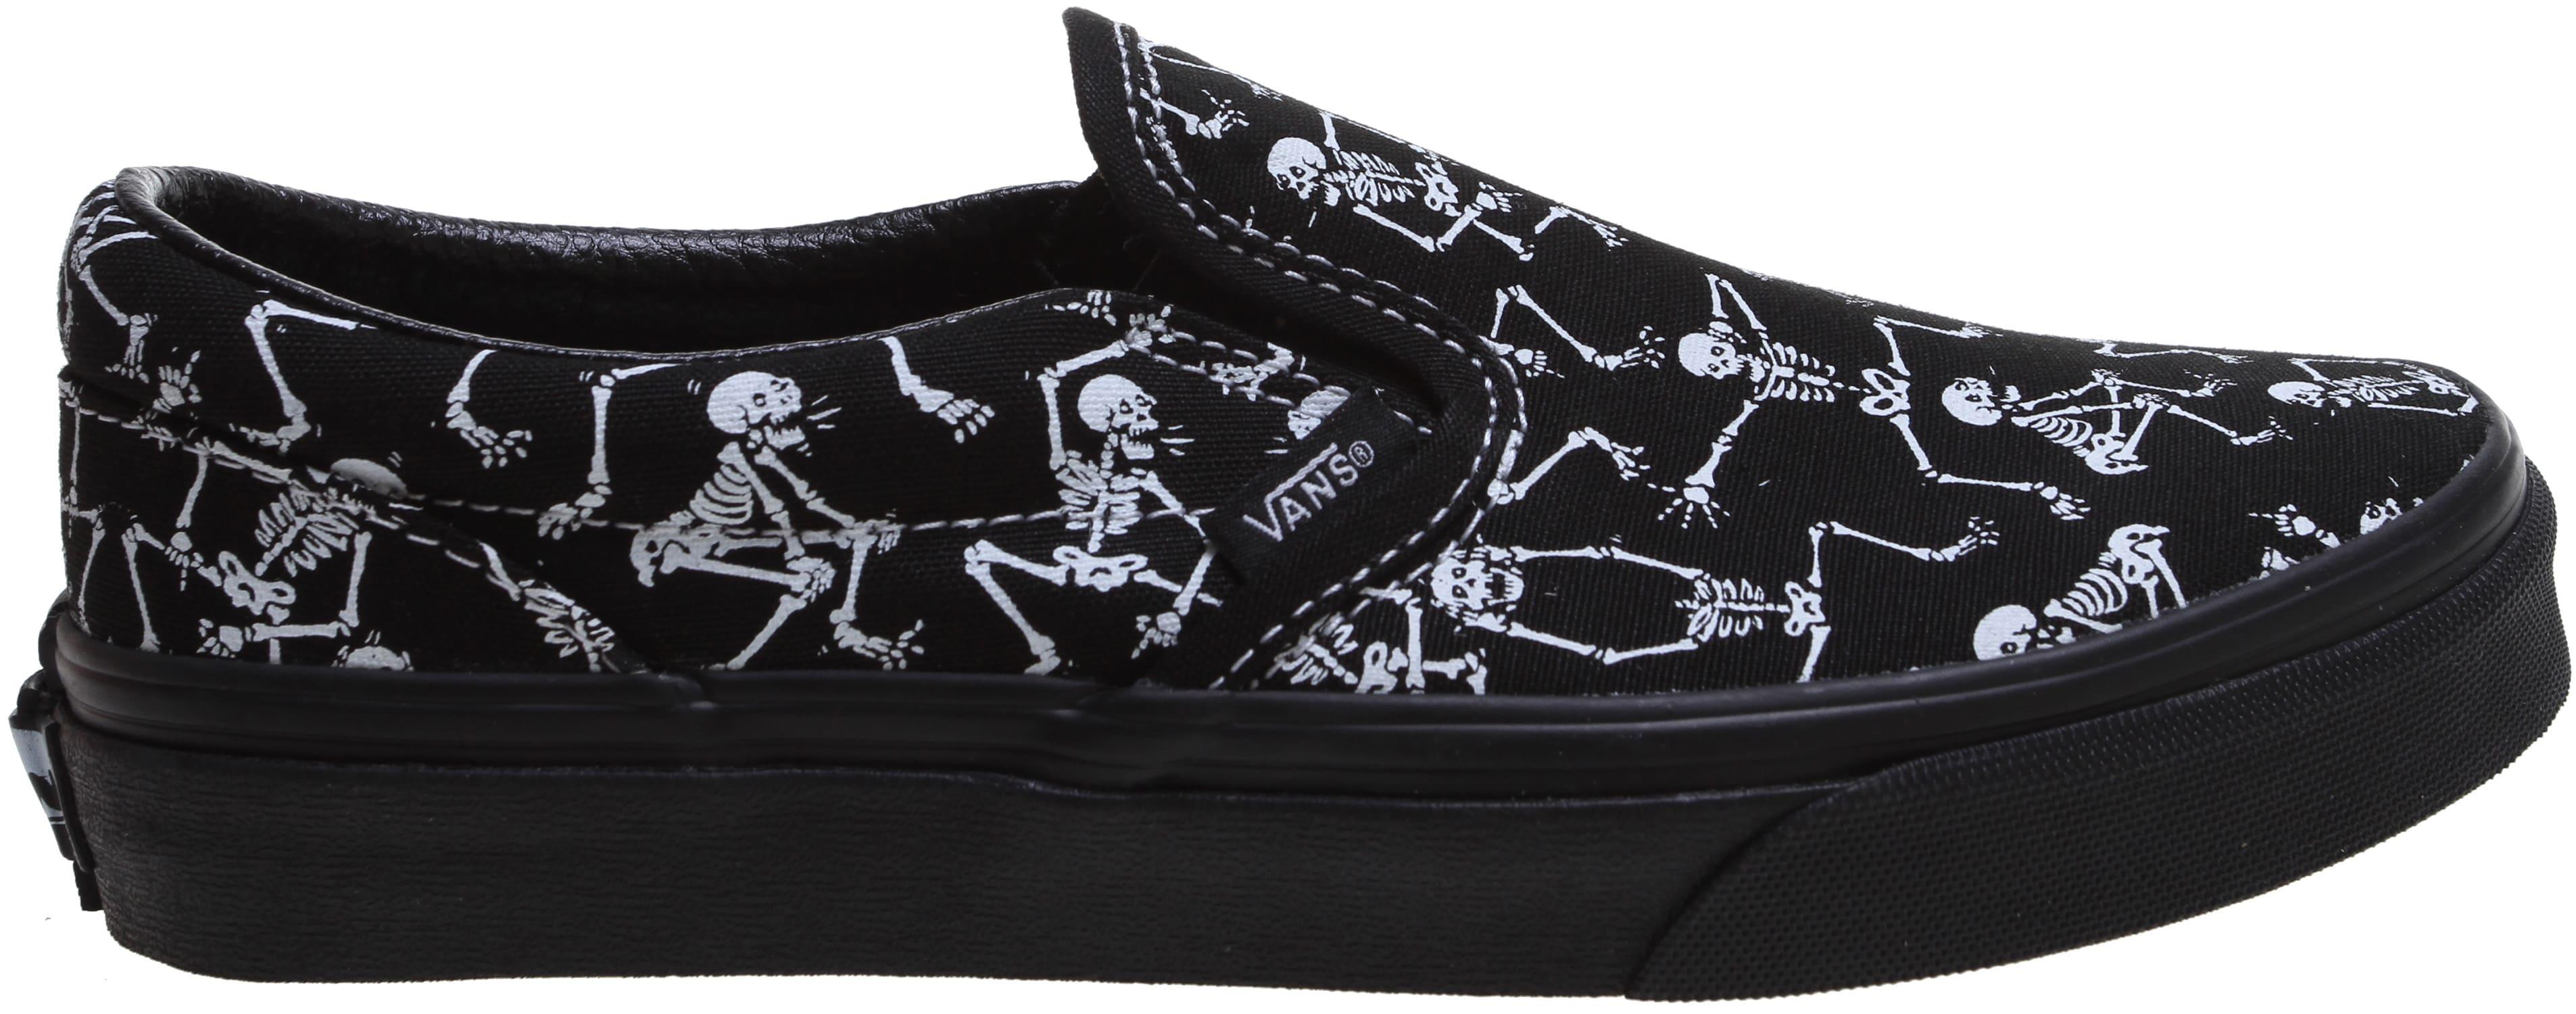 Vans Classic Slip On Bone Dance Skate Shoes Kids Youth